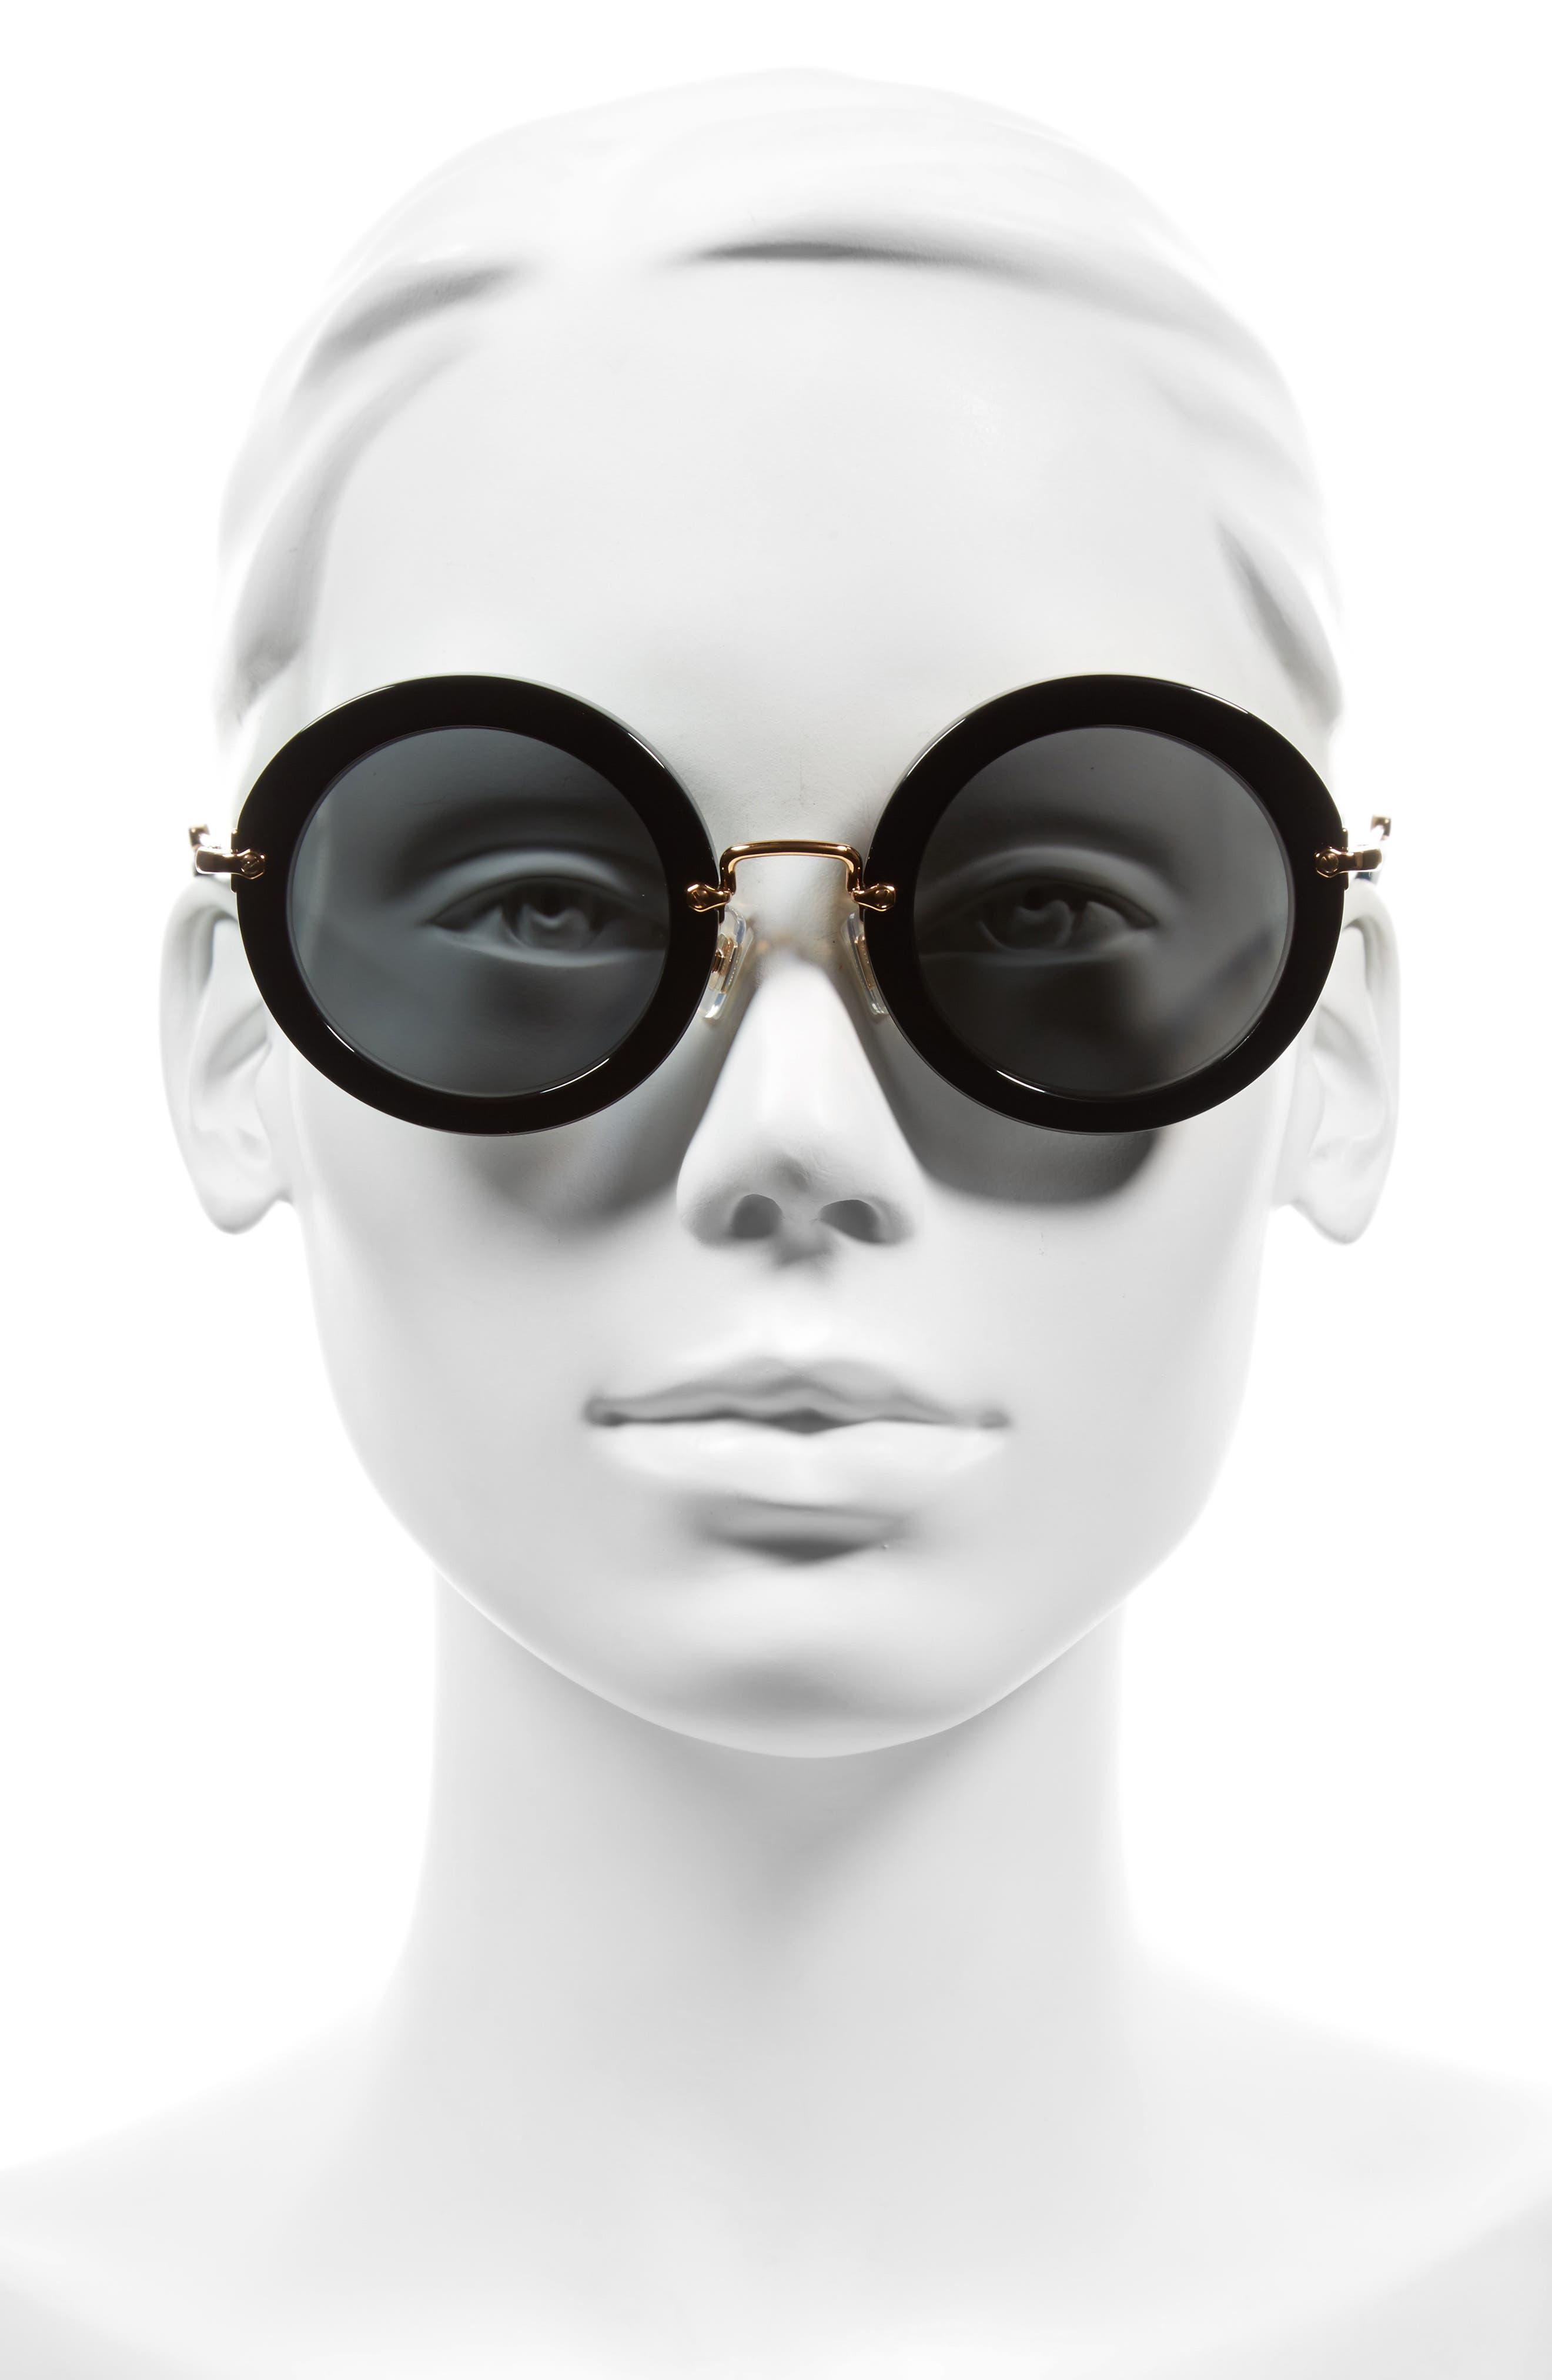 49mm Round Retro Sunglasses,                             Alternate thumbnail 3, color,                             001